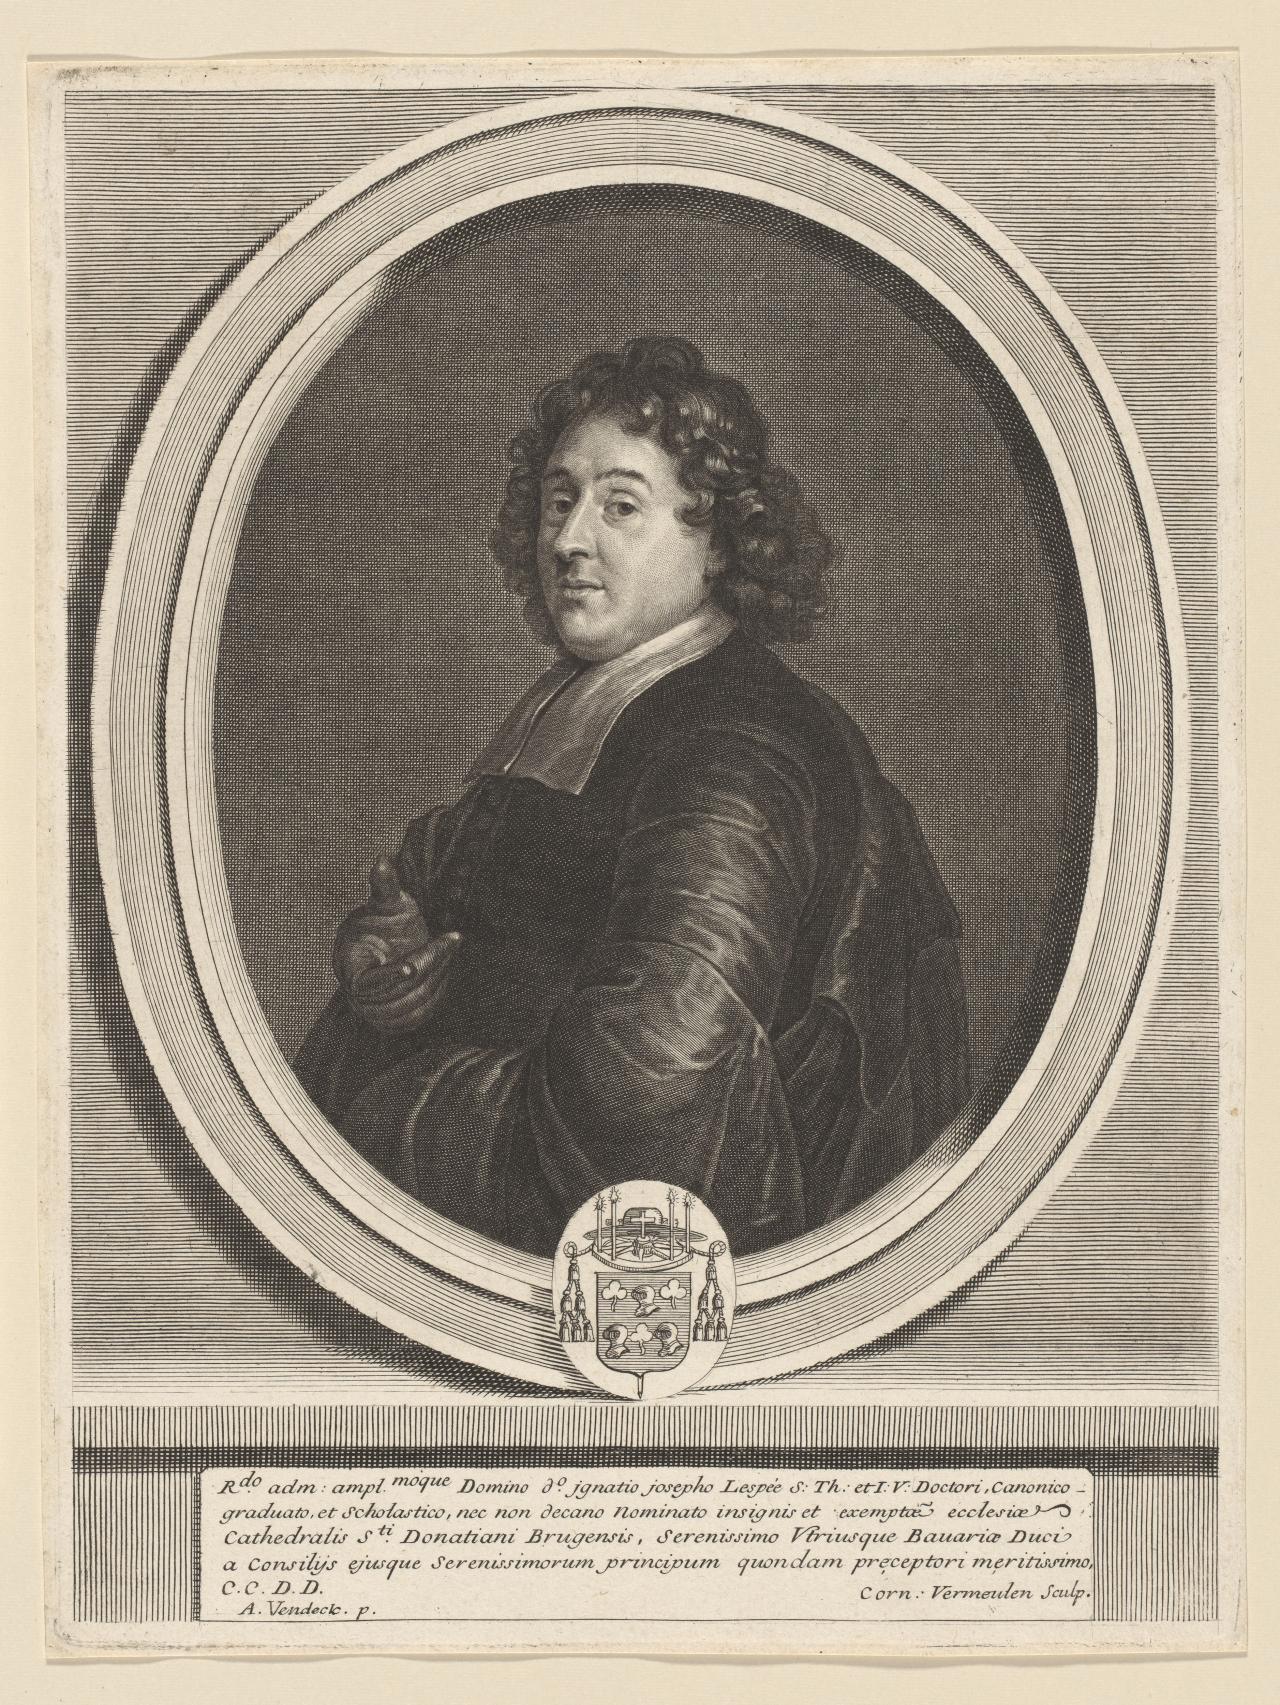 Corn Van Dijck.Canon Ignatius Joseph Lespee Cornelis Vermeulen Engraver